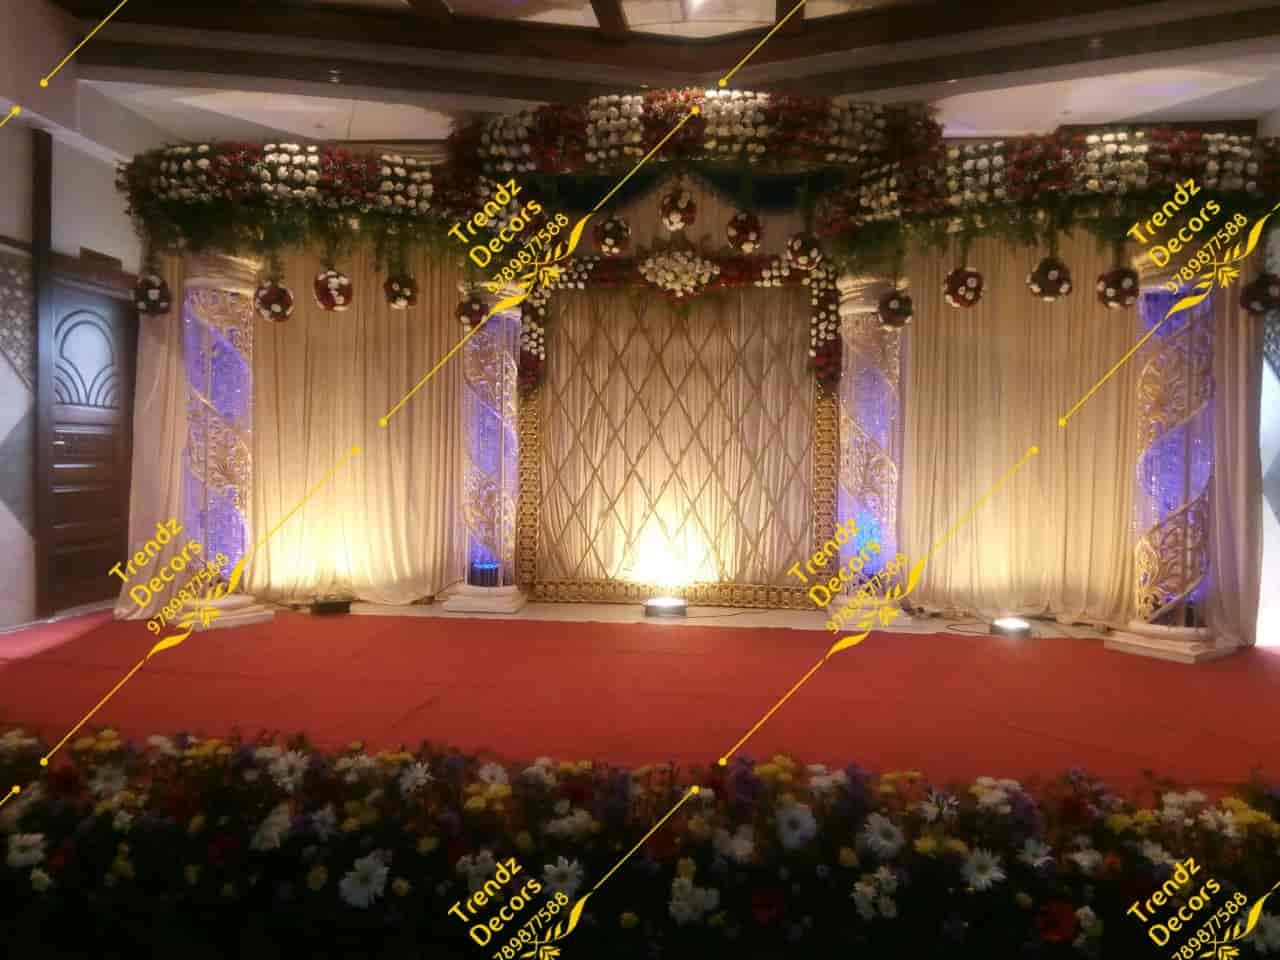 Trendz Decors, Ashok Nagar - Mandap Decorators in Chennai - Justdial